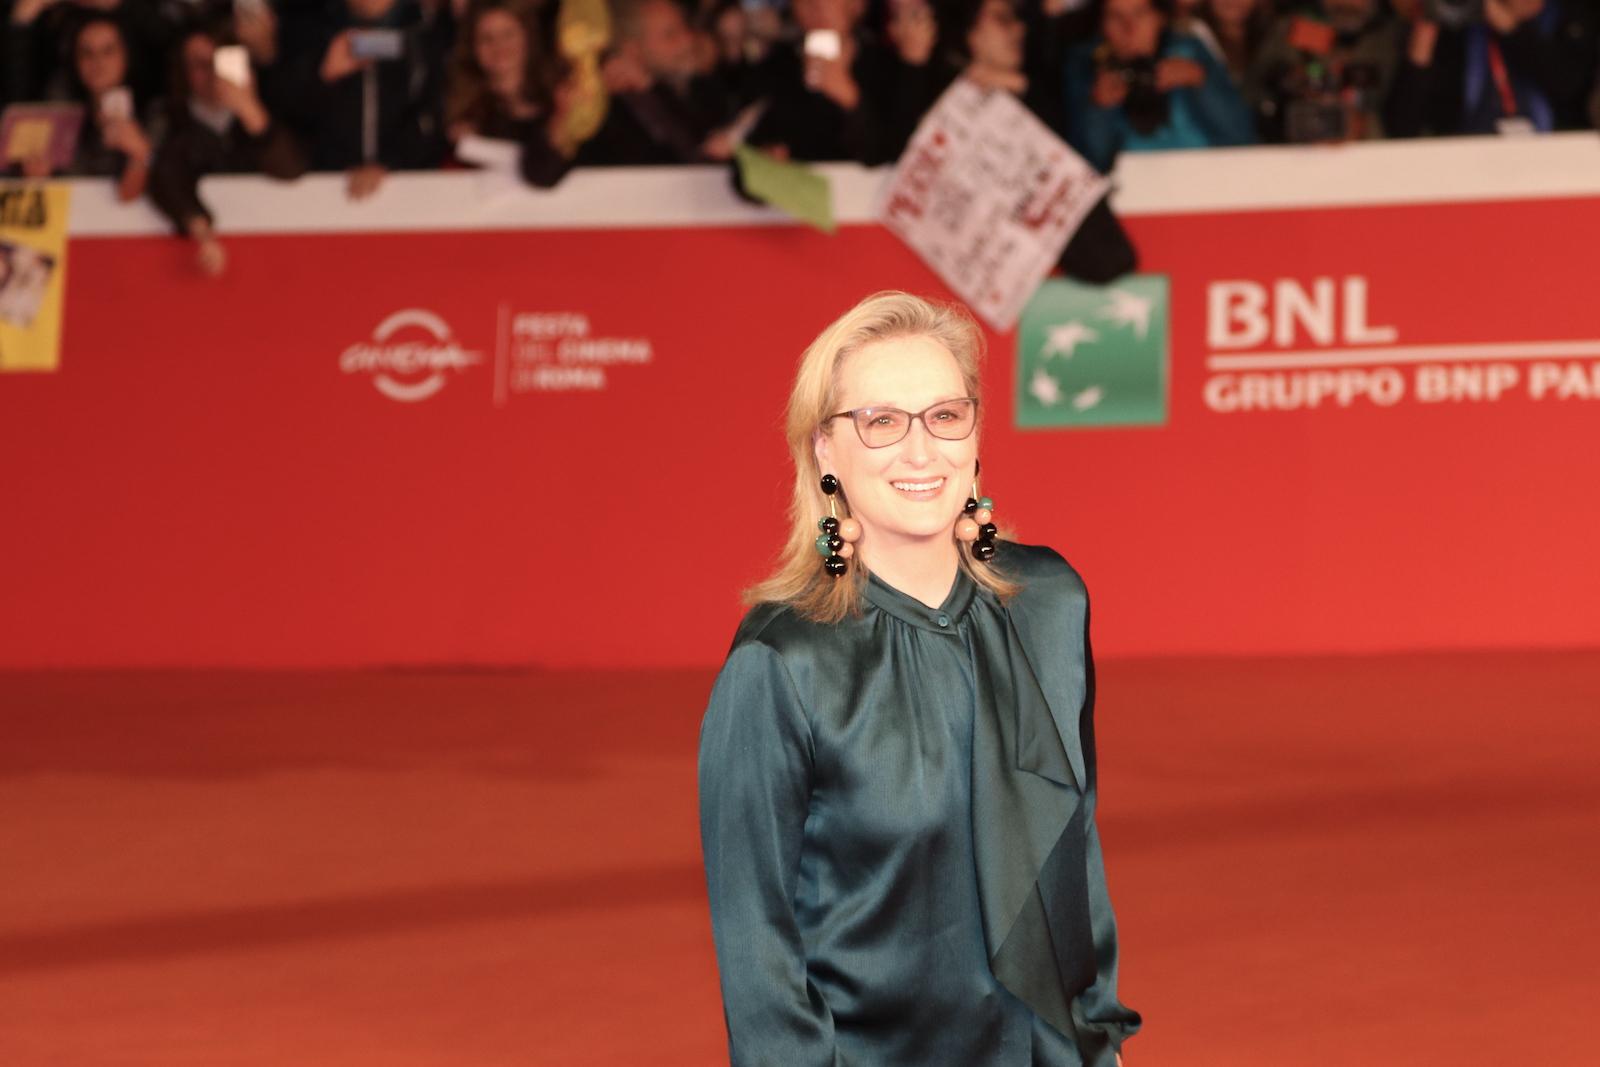 Roma 2016: una foto di Meryl Streep sul red carpet di Florence Foster Jenkins